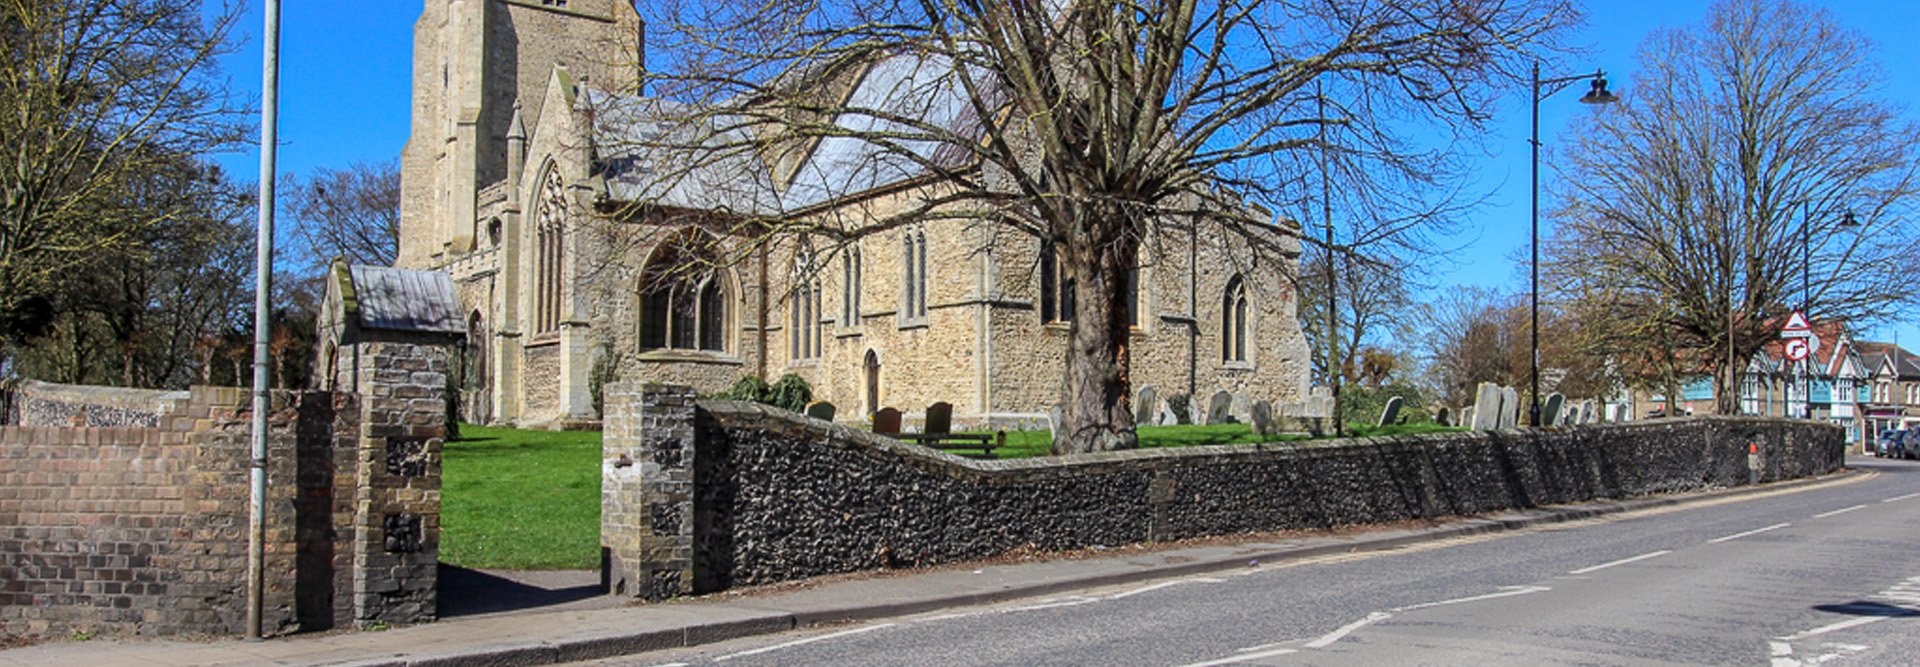 Ely Church